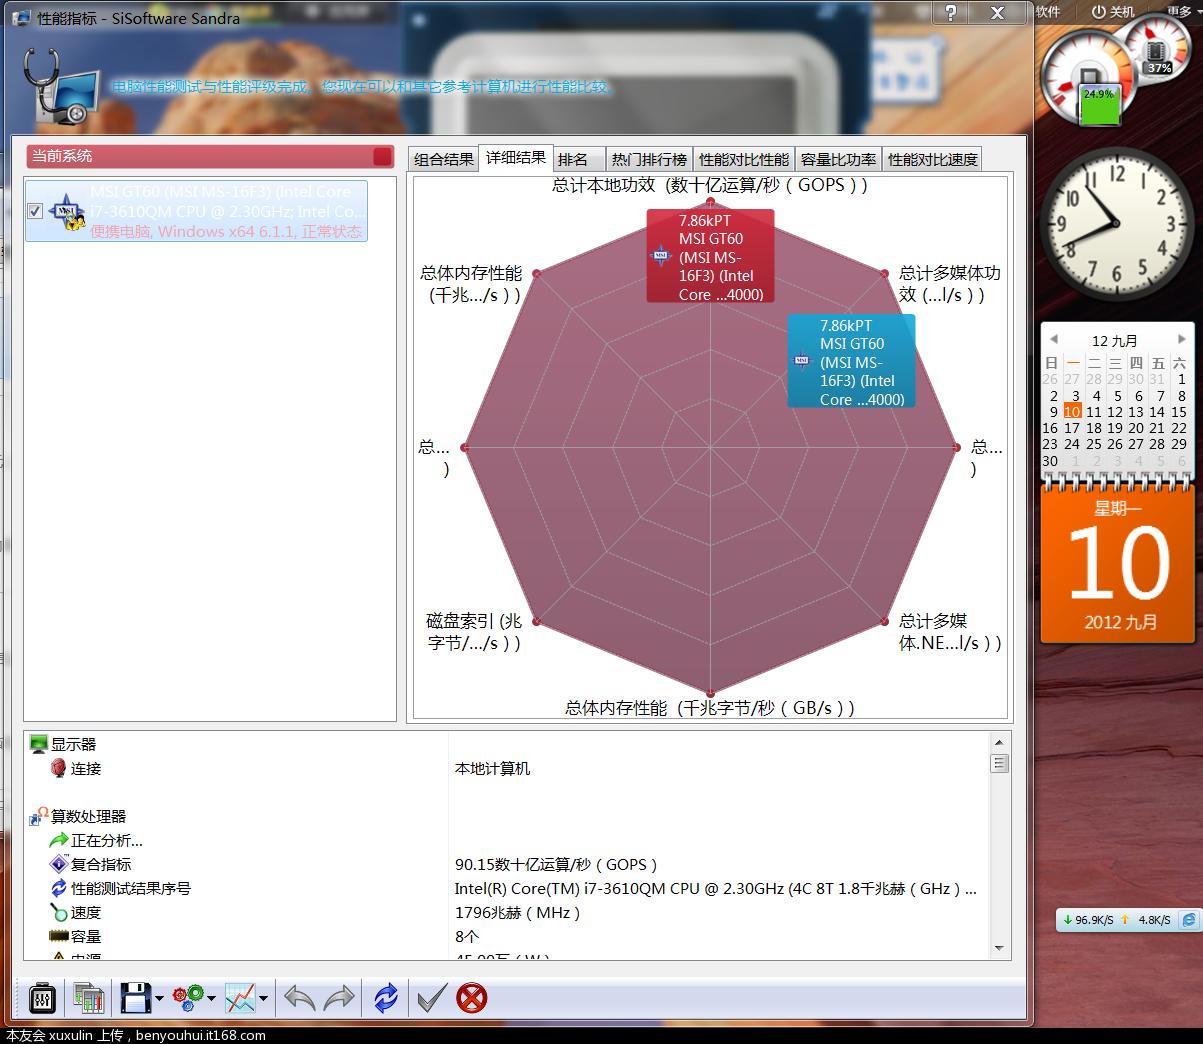 Sisoftware Sandra 截图3.PNG